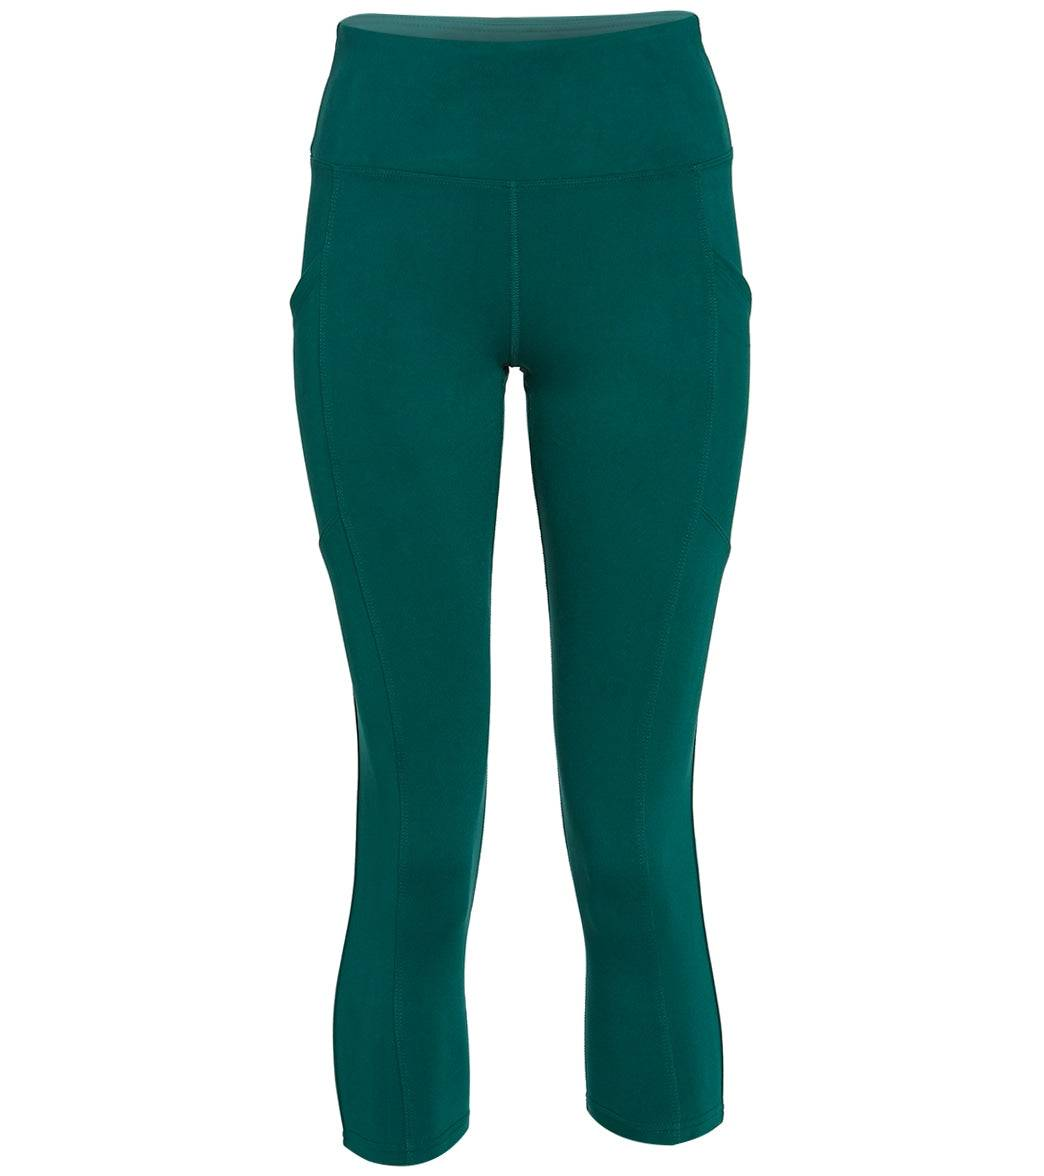 Balance Collection Women's Eclipse Yoga Capri Pants - Botanical Garden Medium Cotton